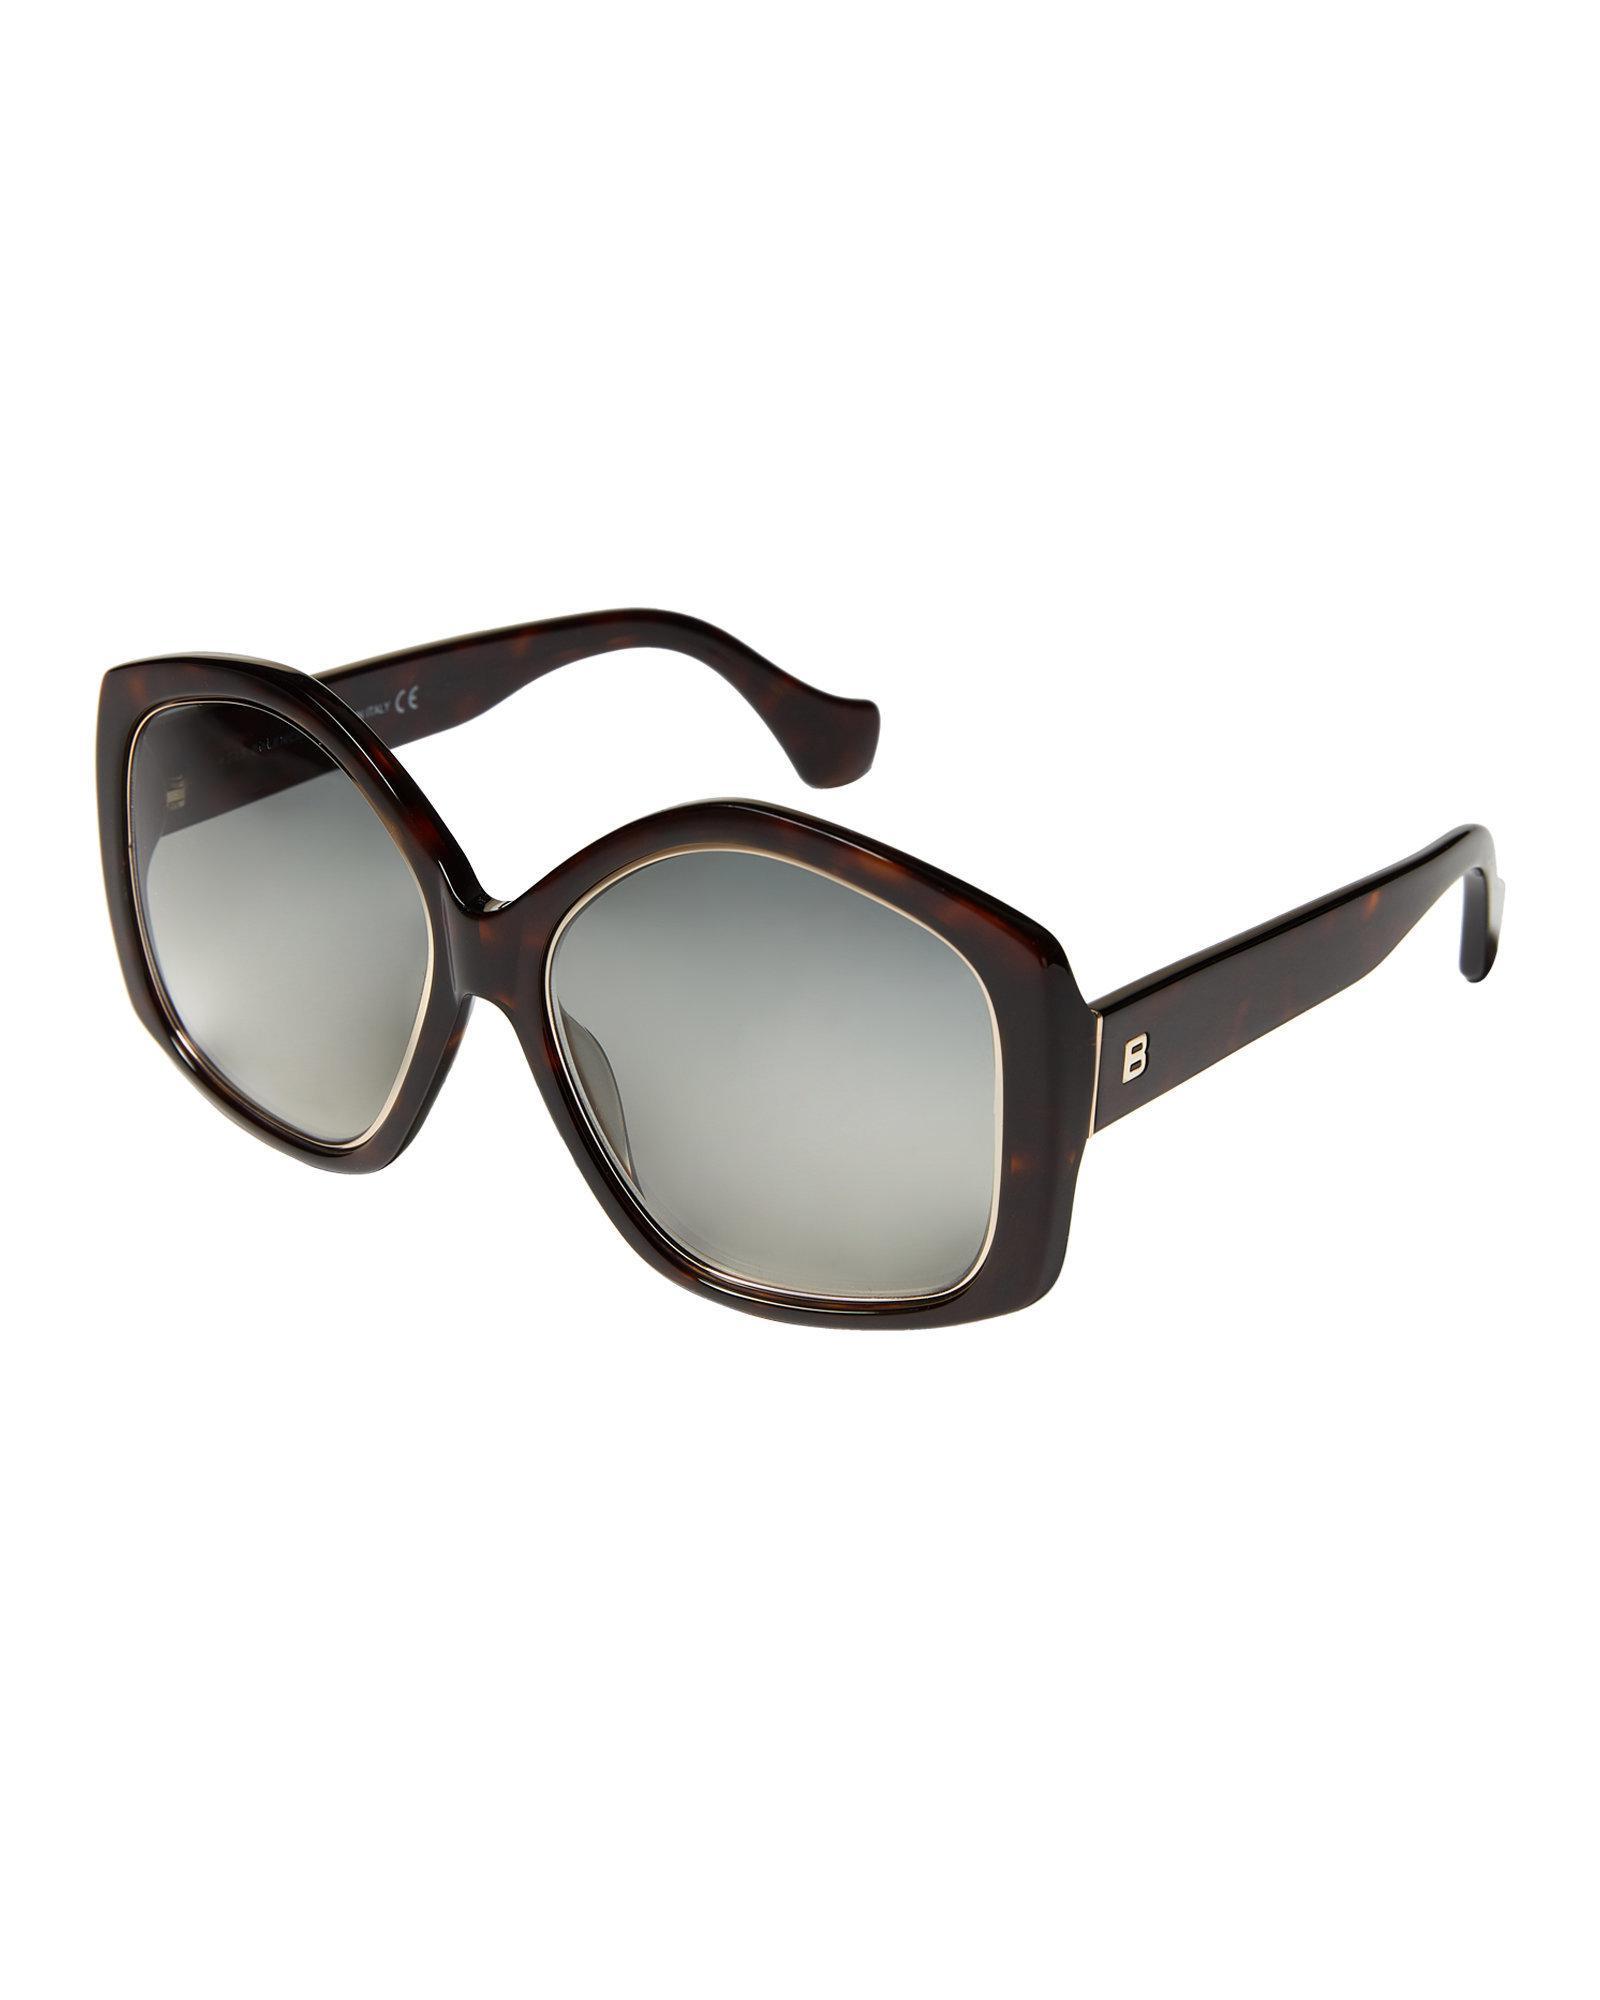 c78b2de5d0 Lyst - Balenciaga Ba0049 Tortoiseshell-look   Gold-tone Round Sunglasses